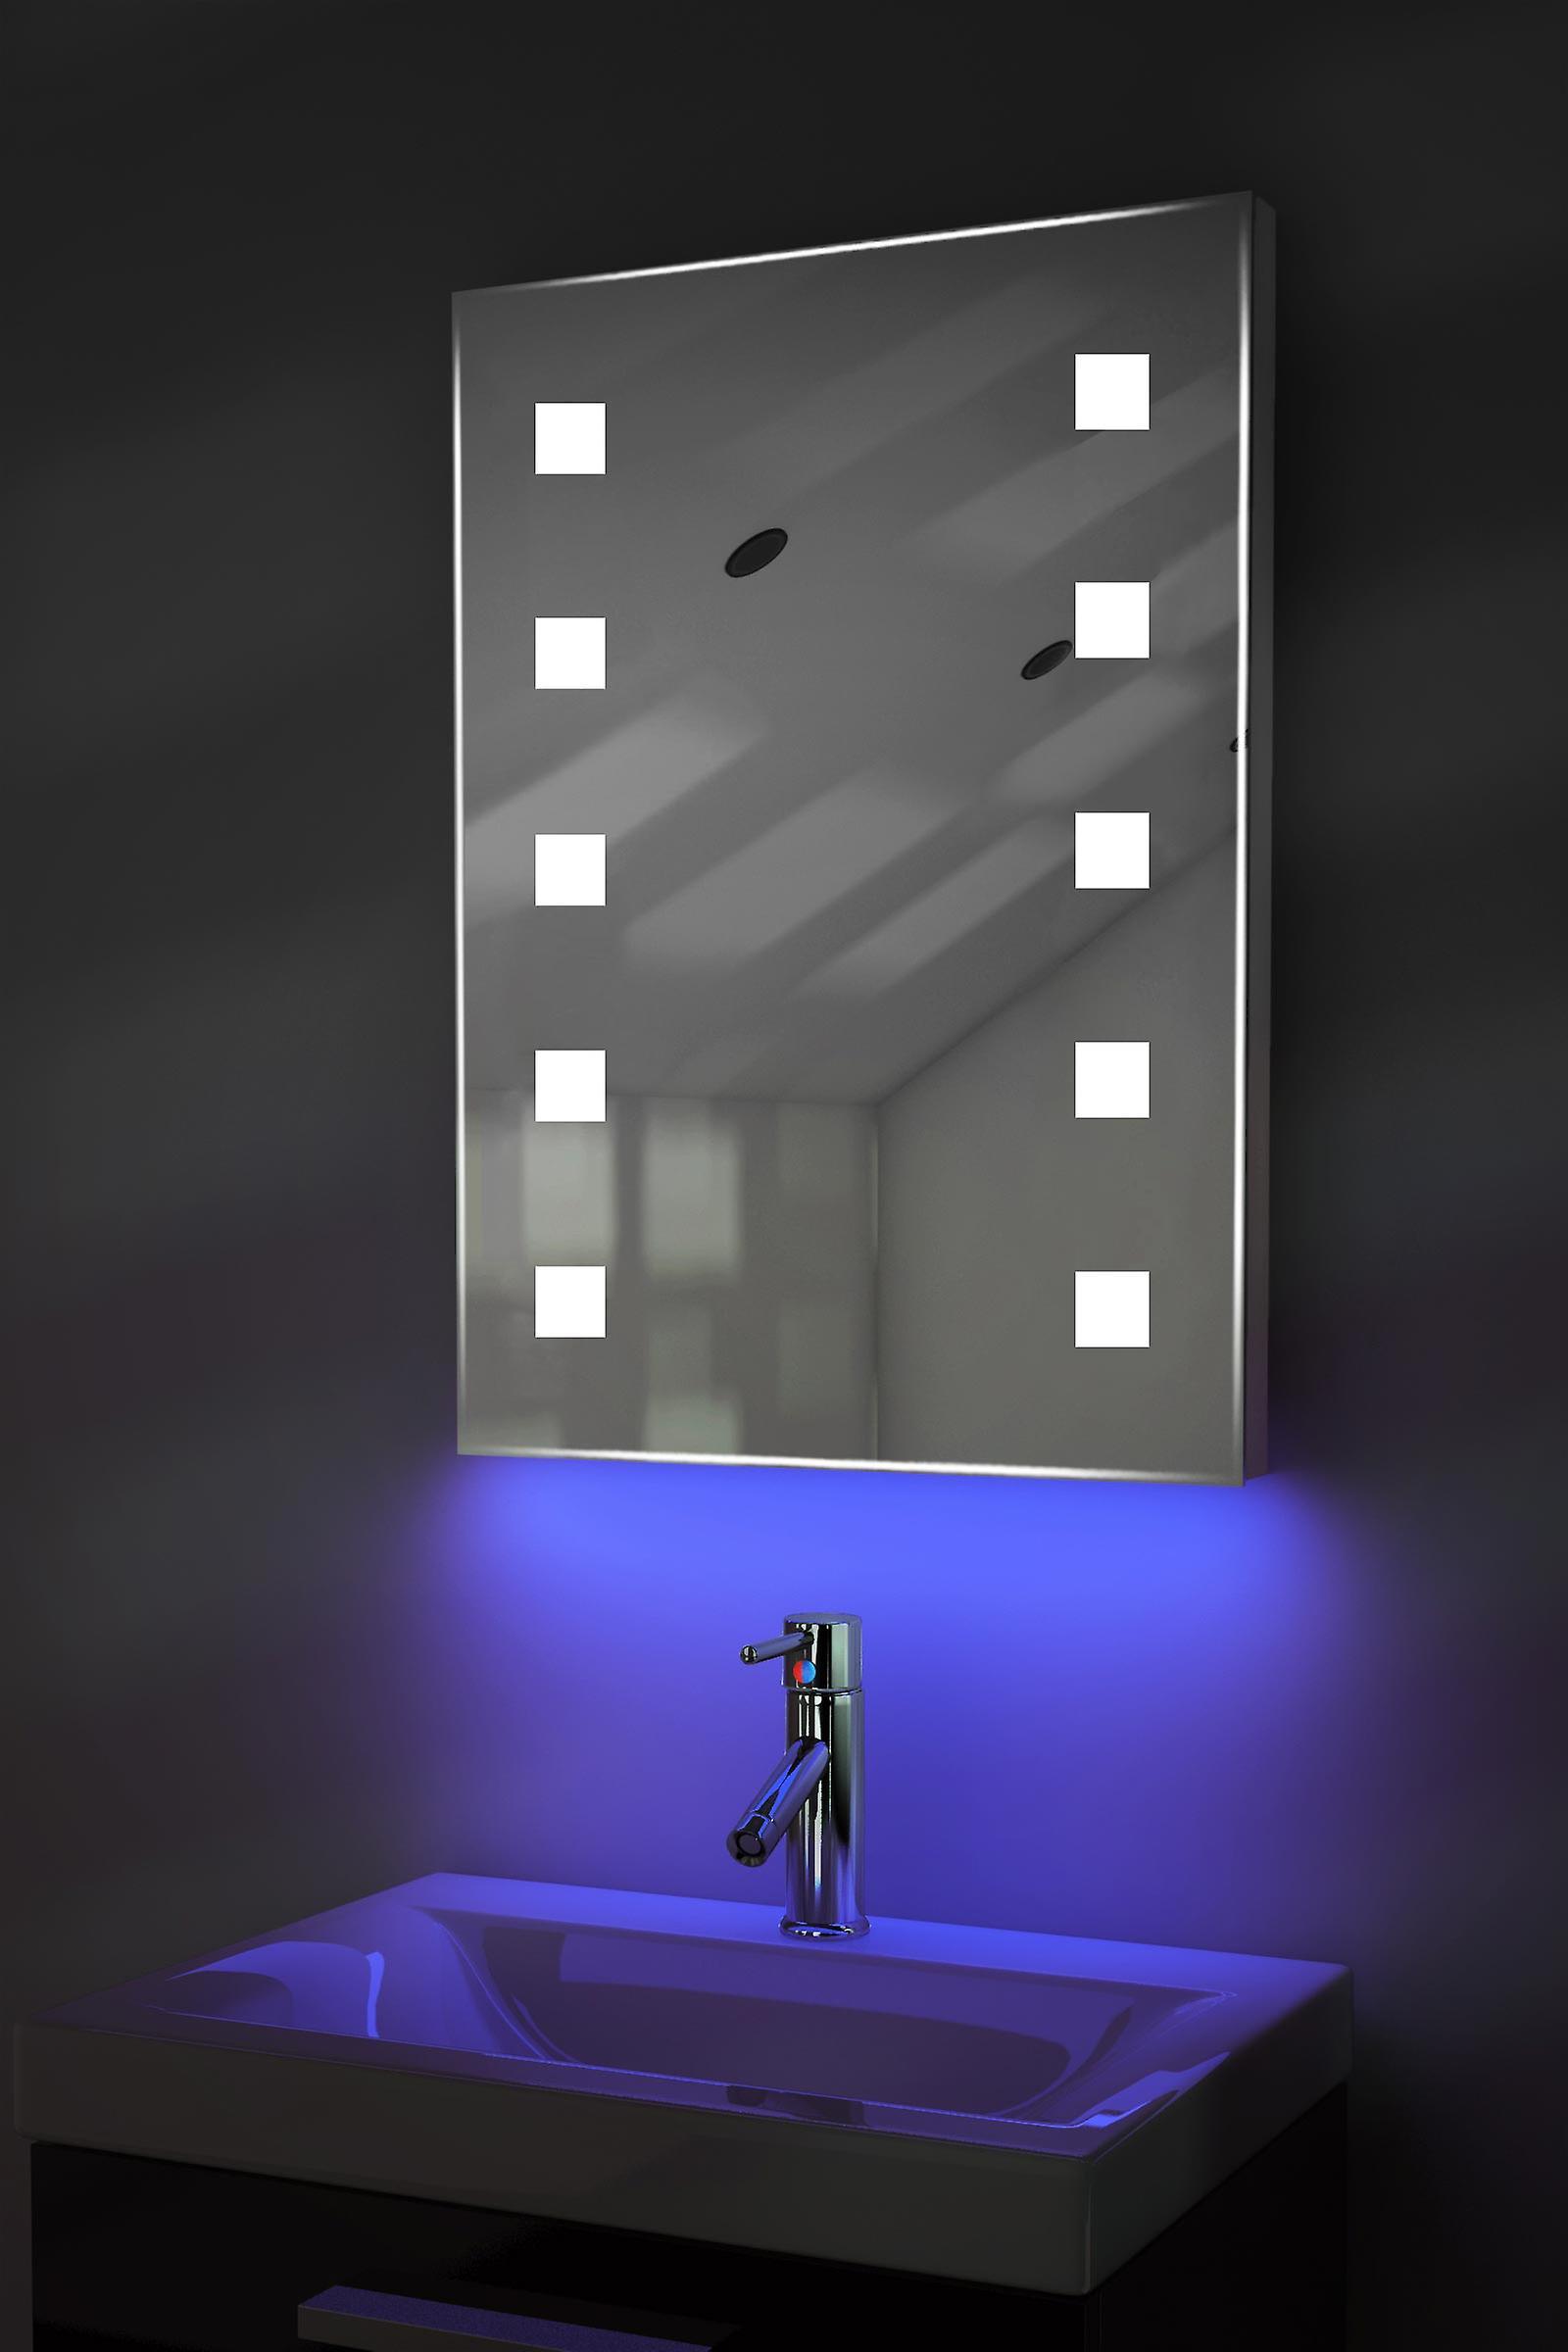 Ambient Ultra Slim Mirror With Demister, Shaver & Sensor k207iW